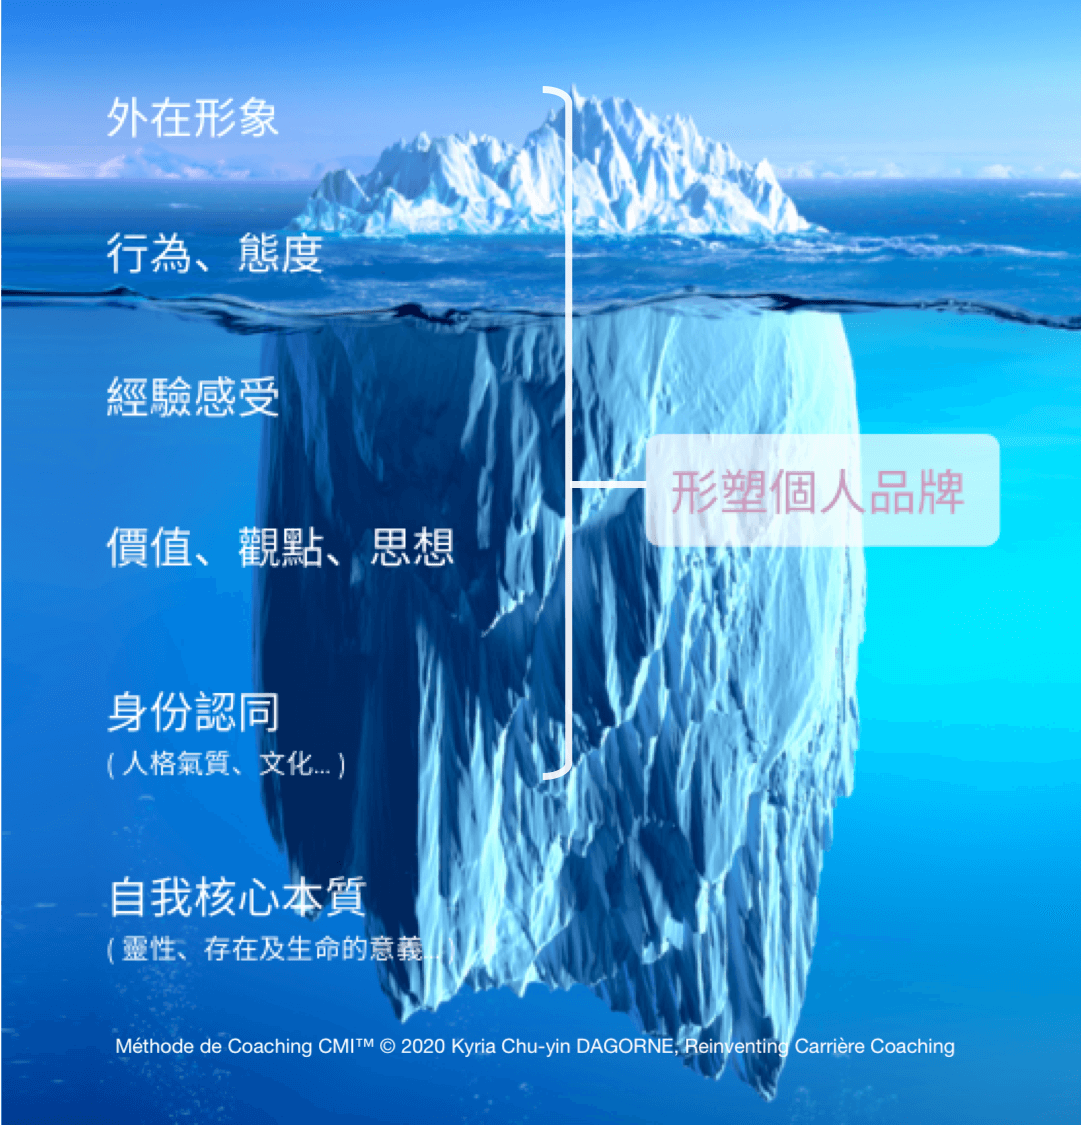 Personal Branding 個人品牌 (iceberg)